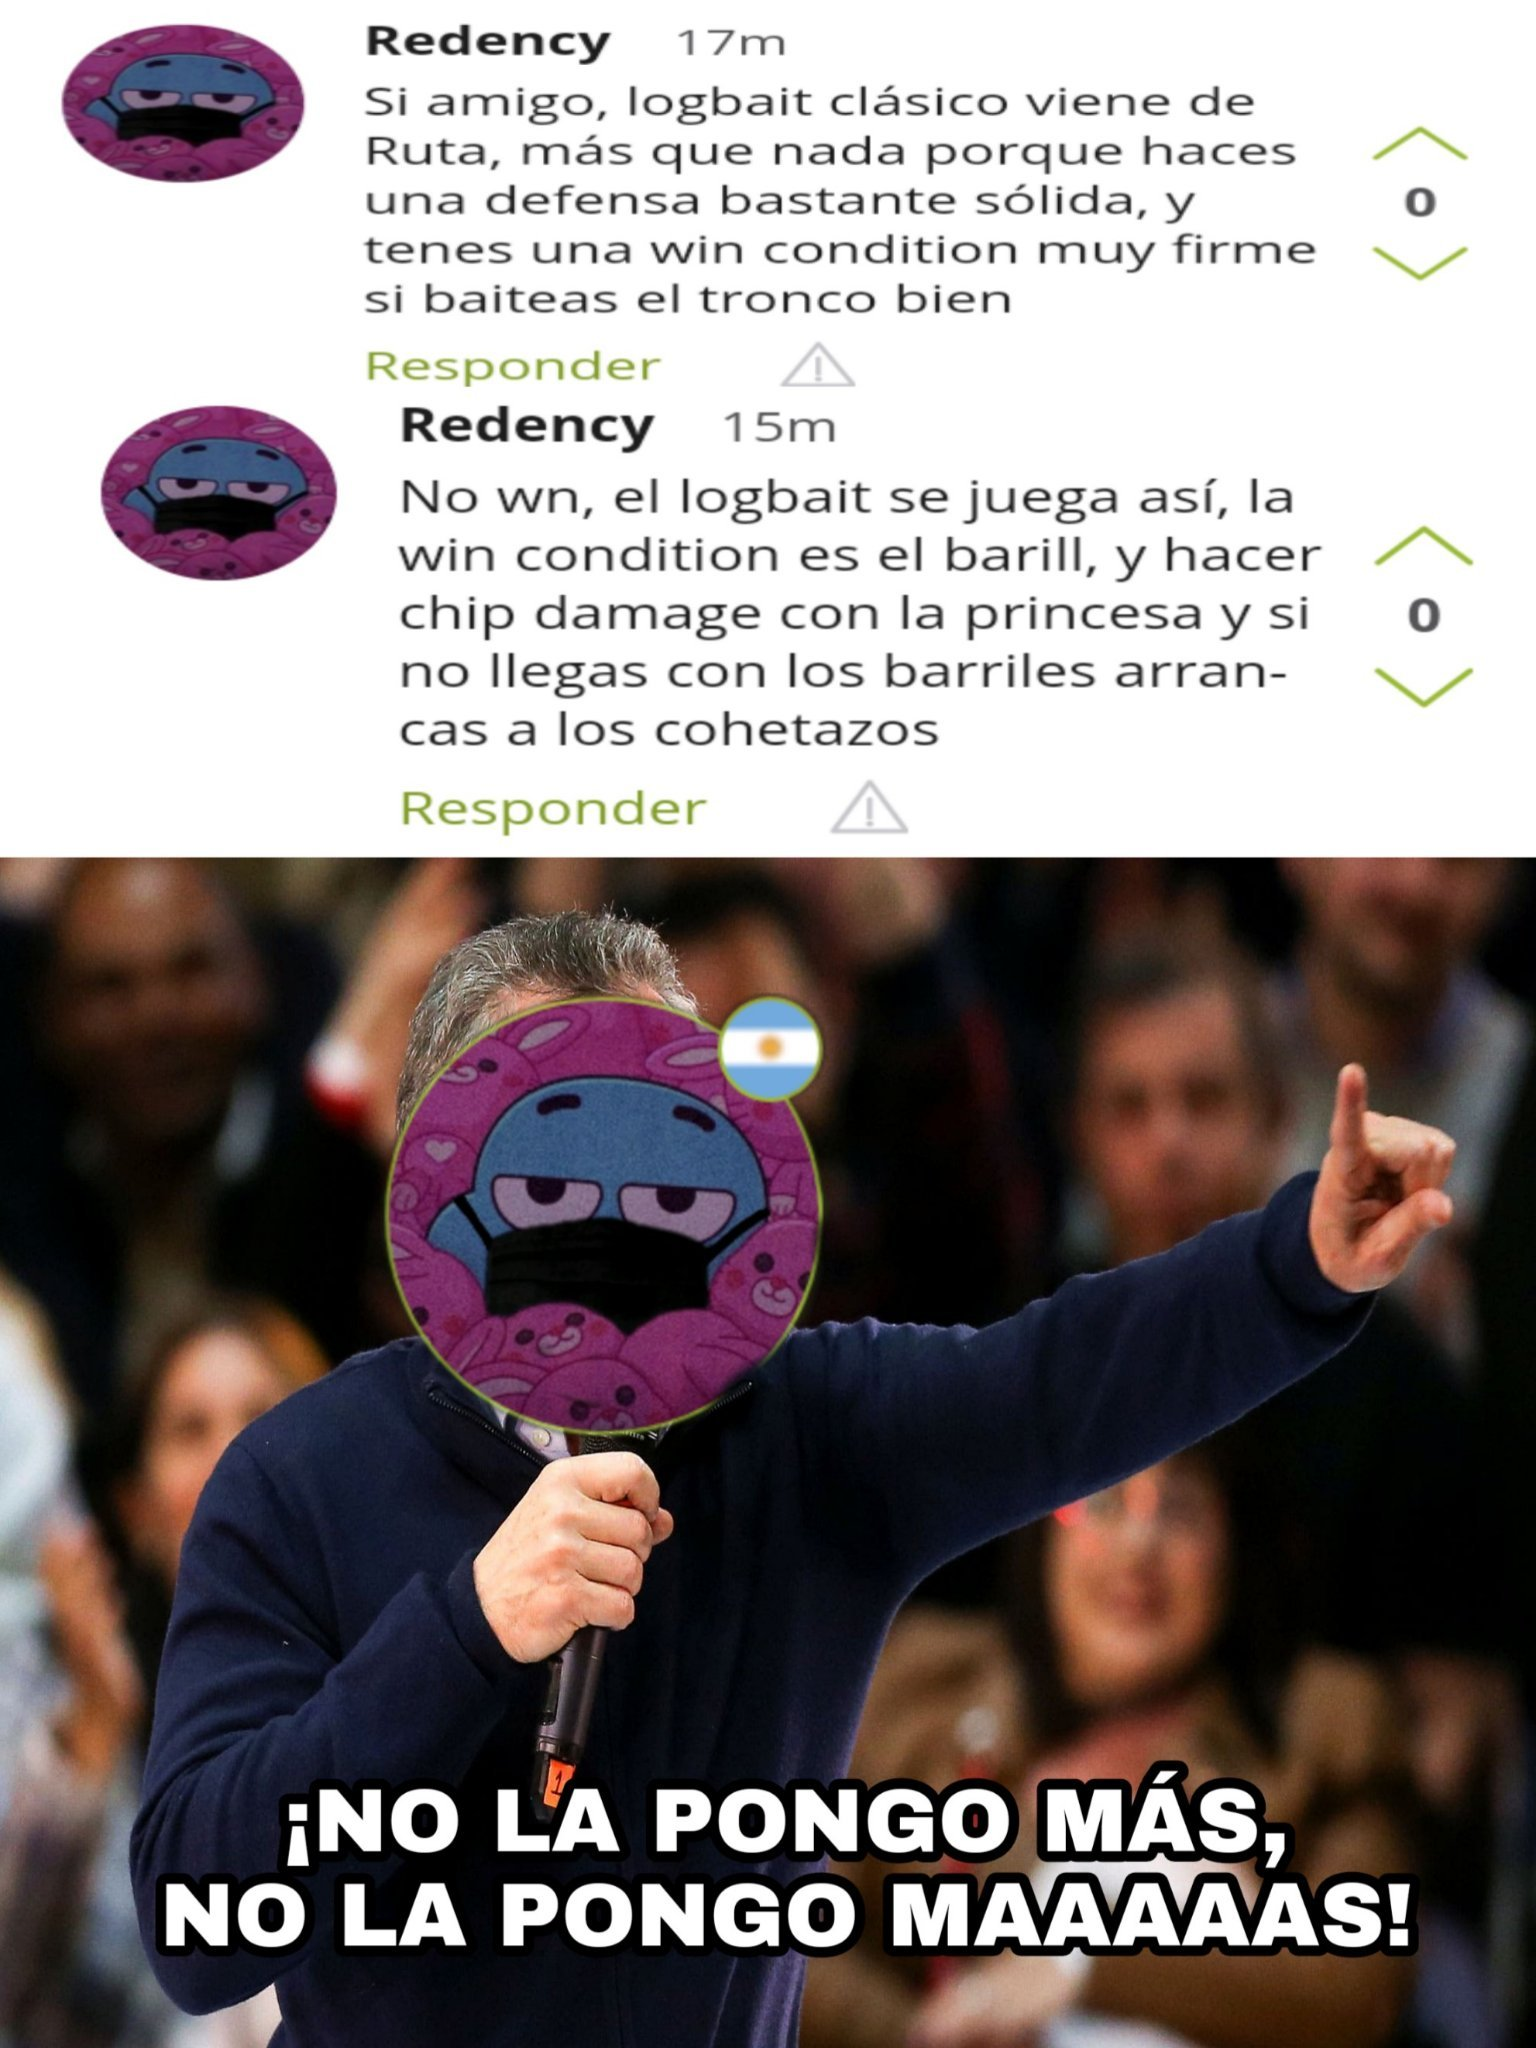 XDDDDDDDDDDDDDDDDDDDDDDDD - meme